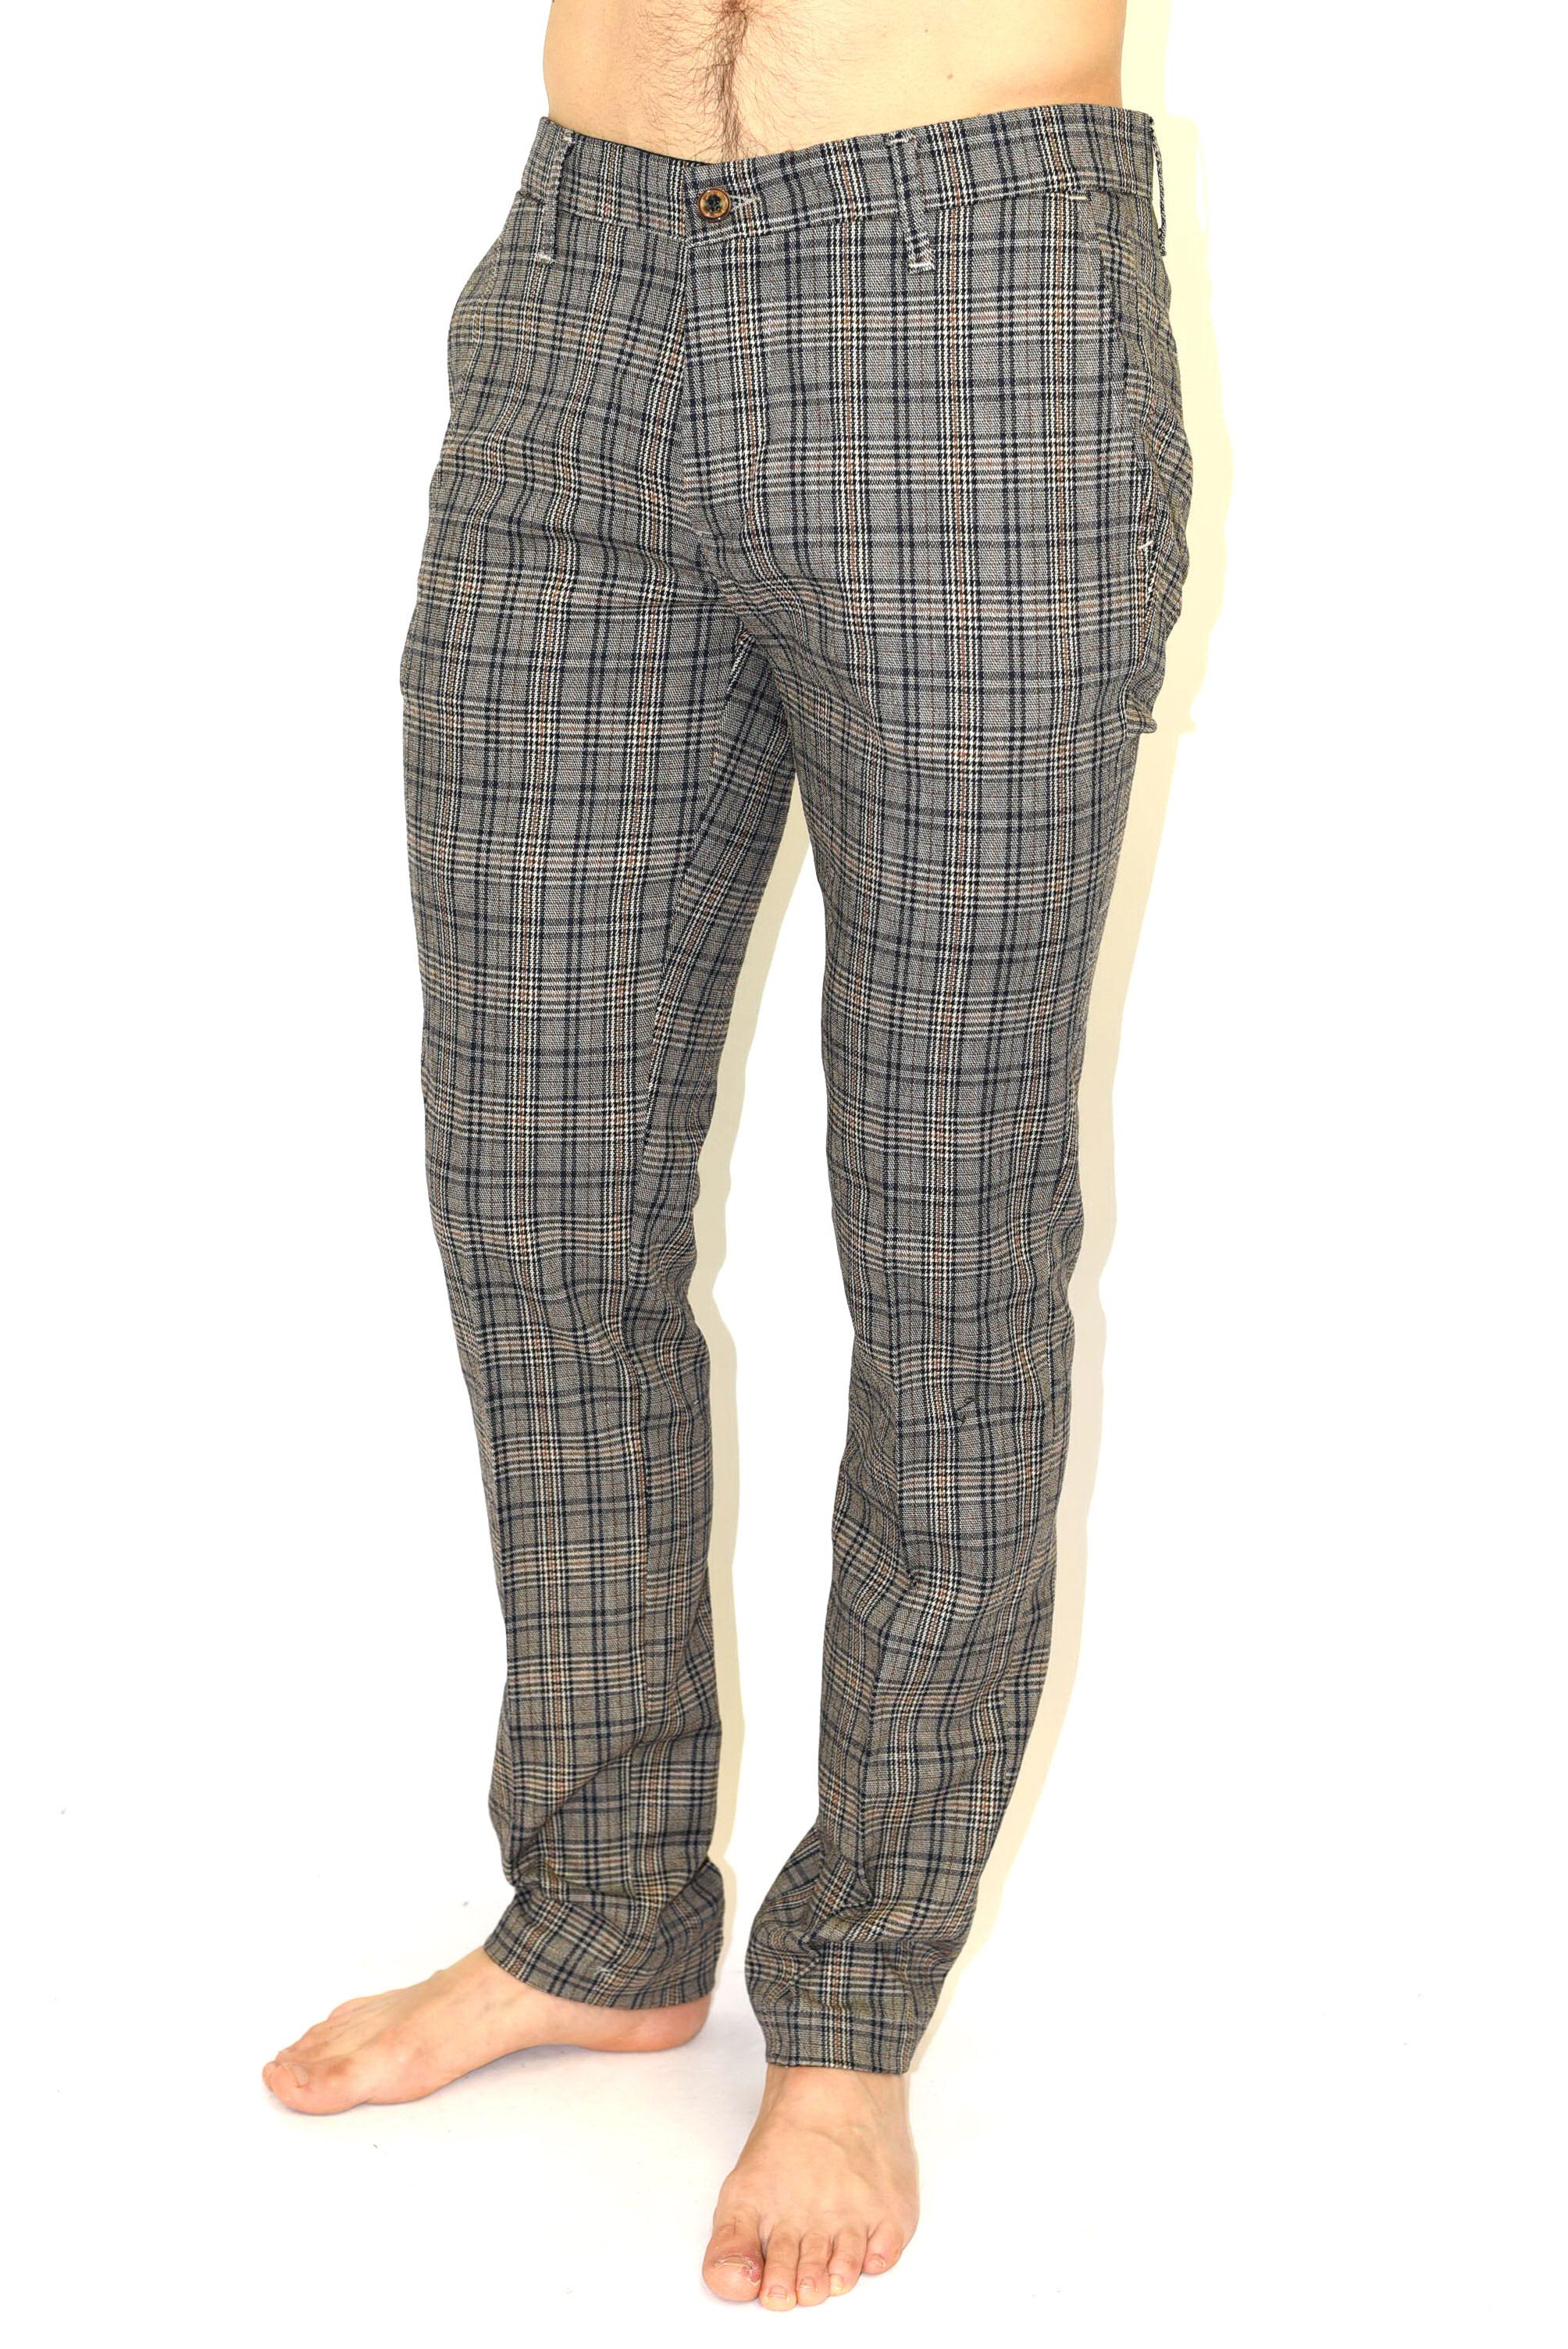 5c718af8a838c4 Pantalone chino fantasia scozzese di Imperial - Pantaloni Uomo | Uplà